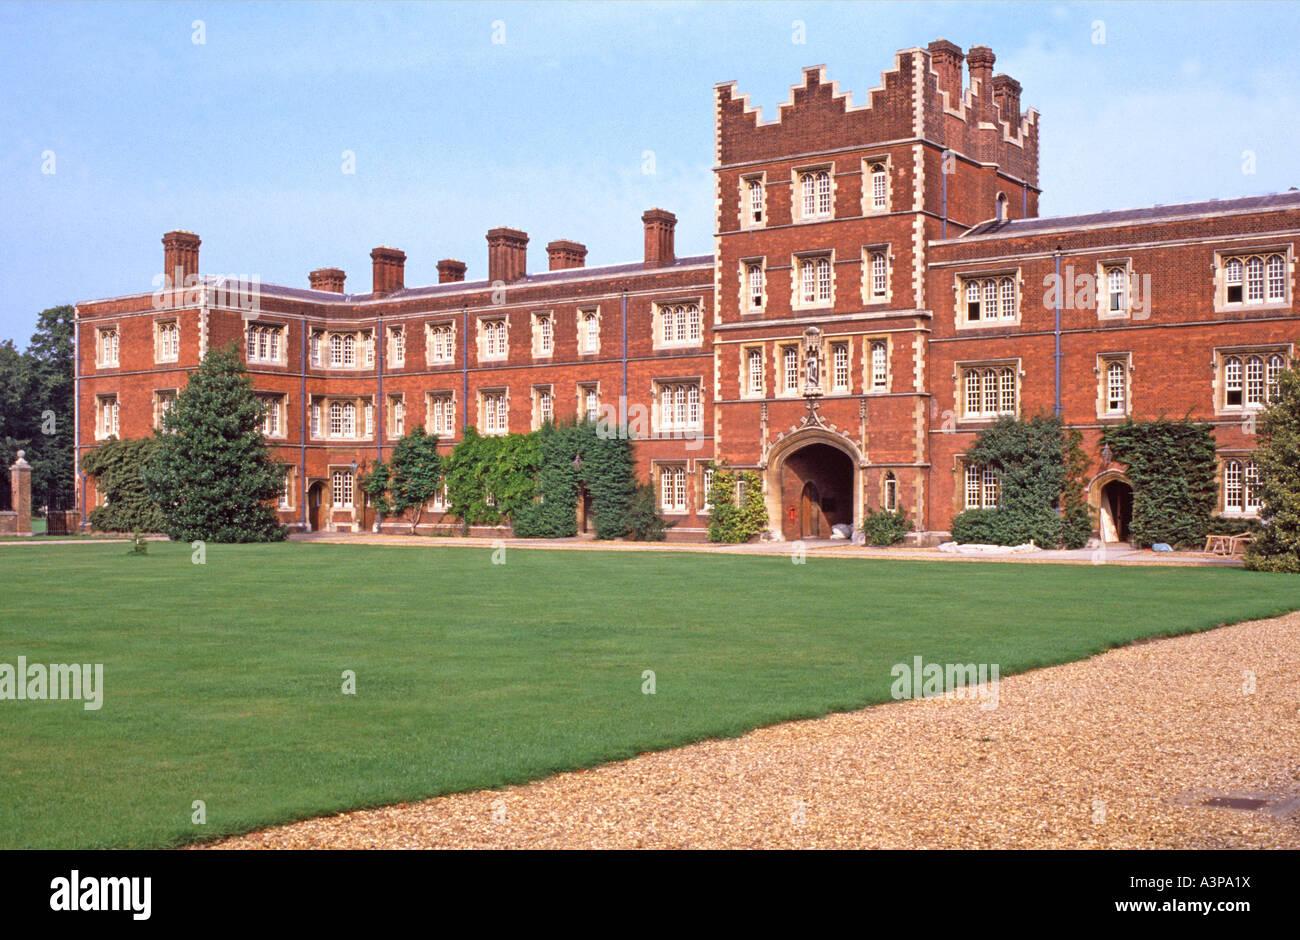 Jesus College University ot Cambridge Cambridgeshire UK - Stock Image